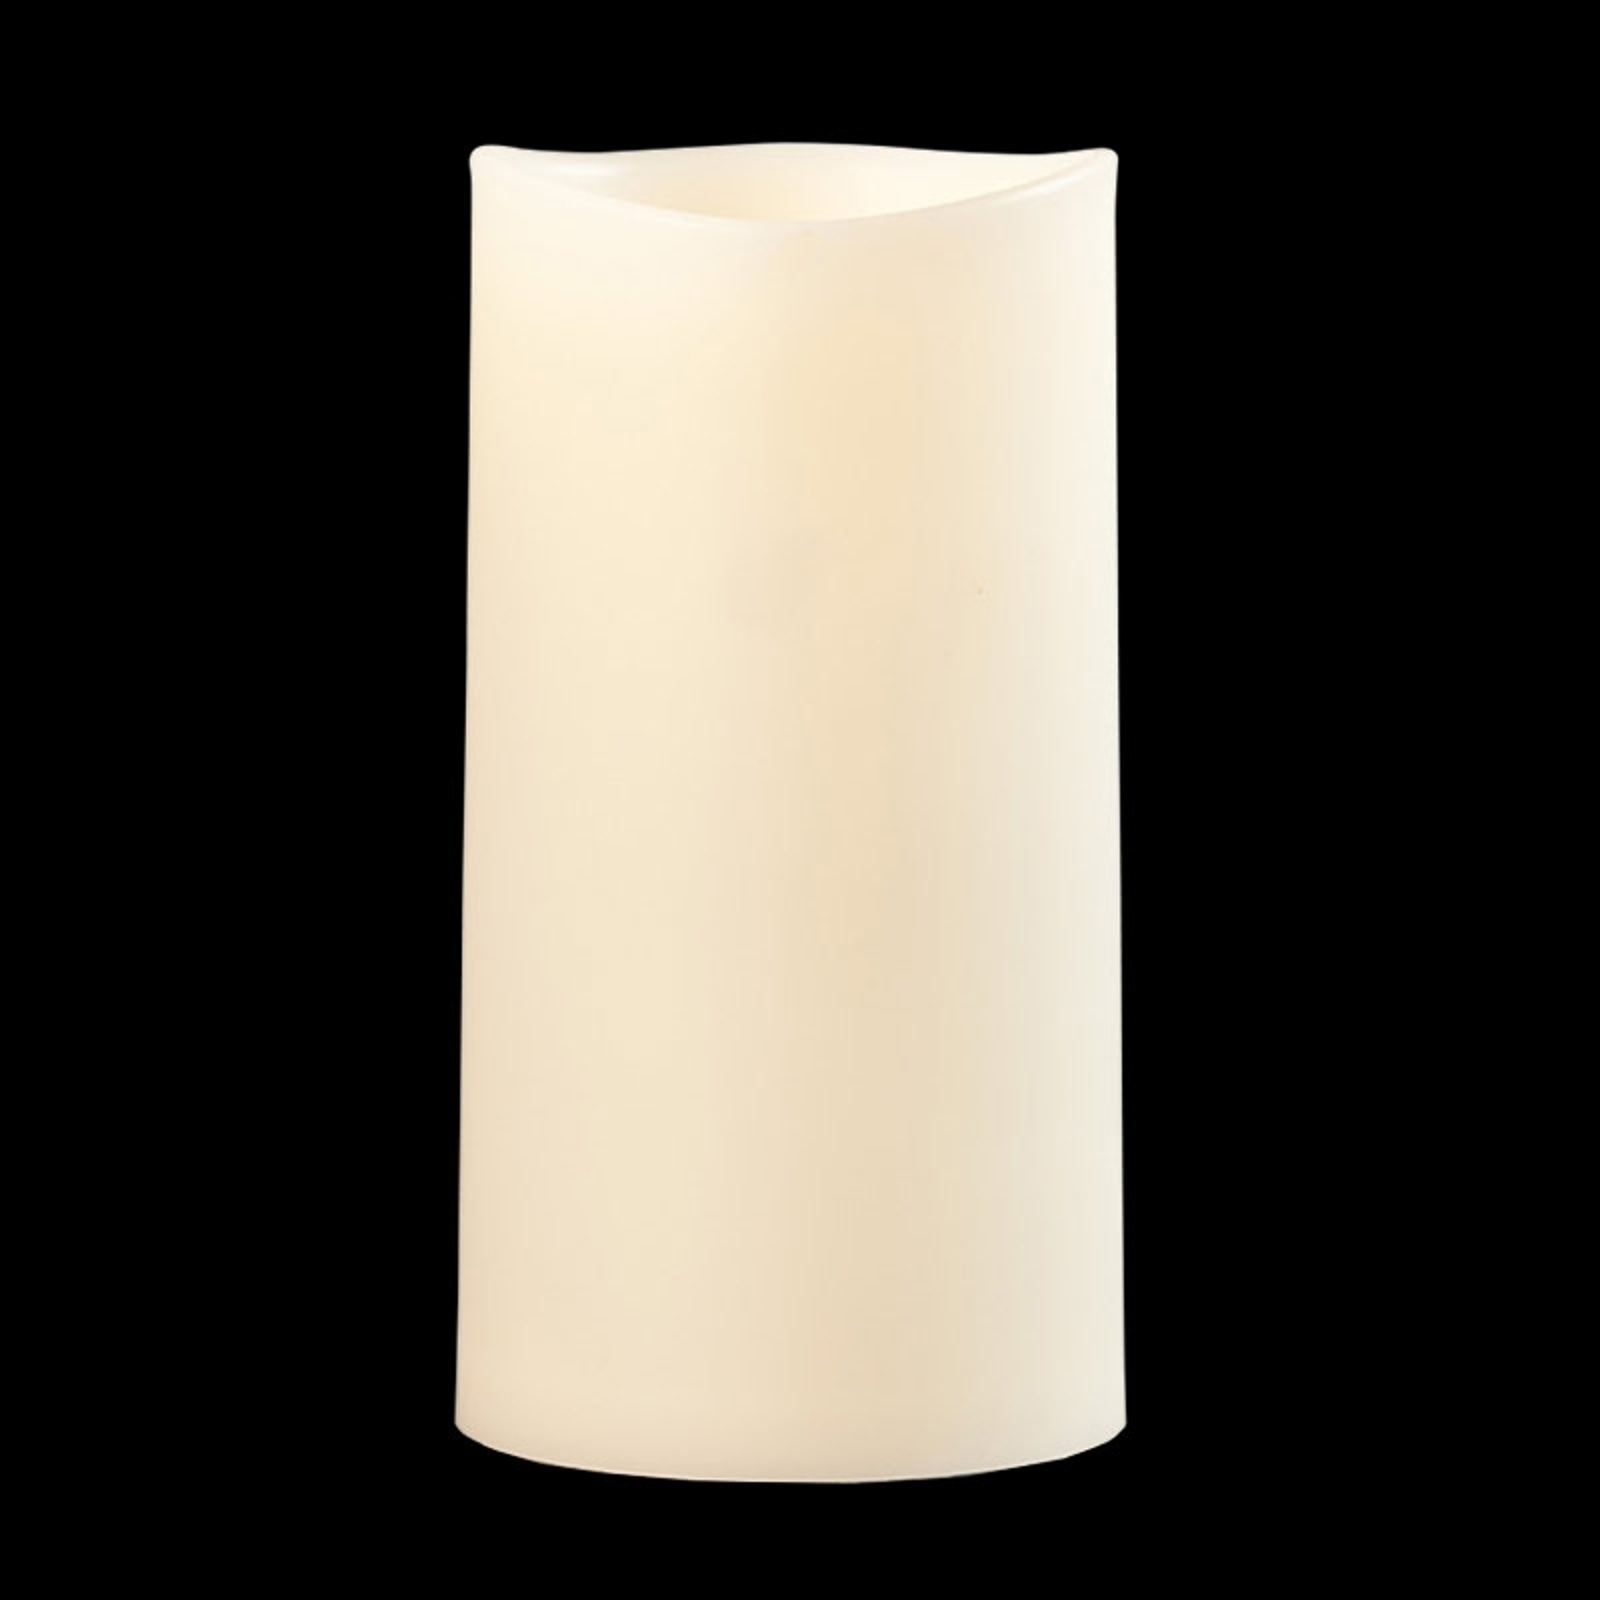 Lampe déco LED Outdoor Candle 17cm